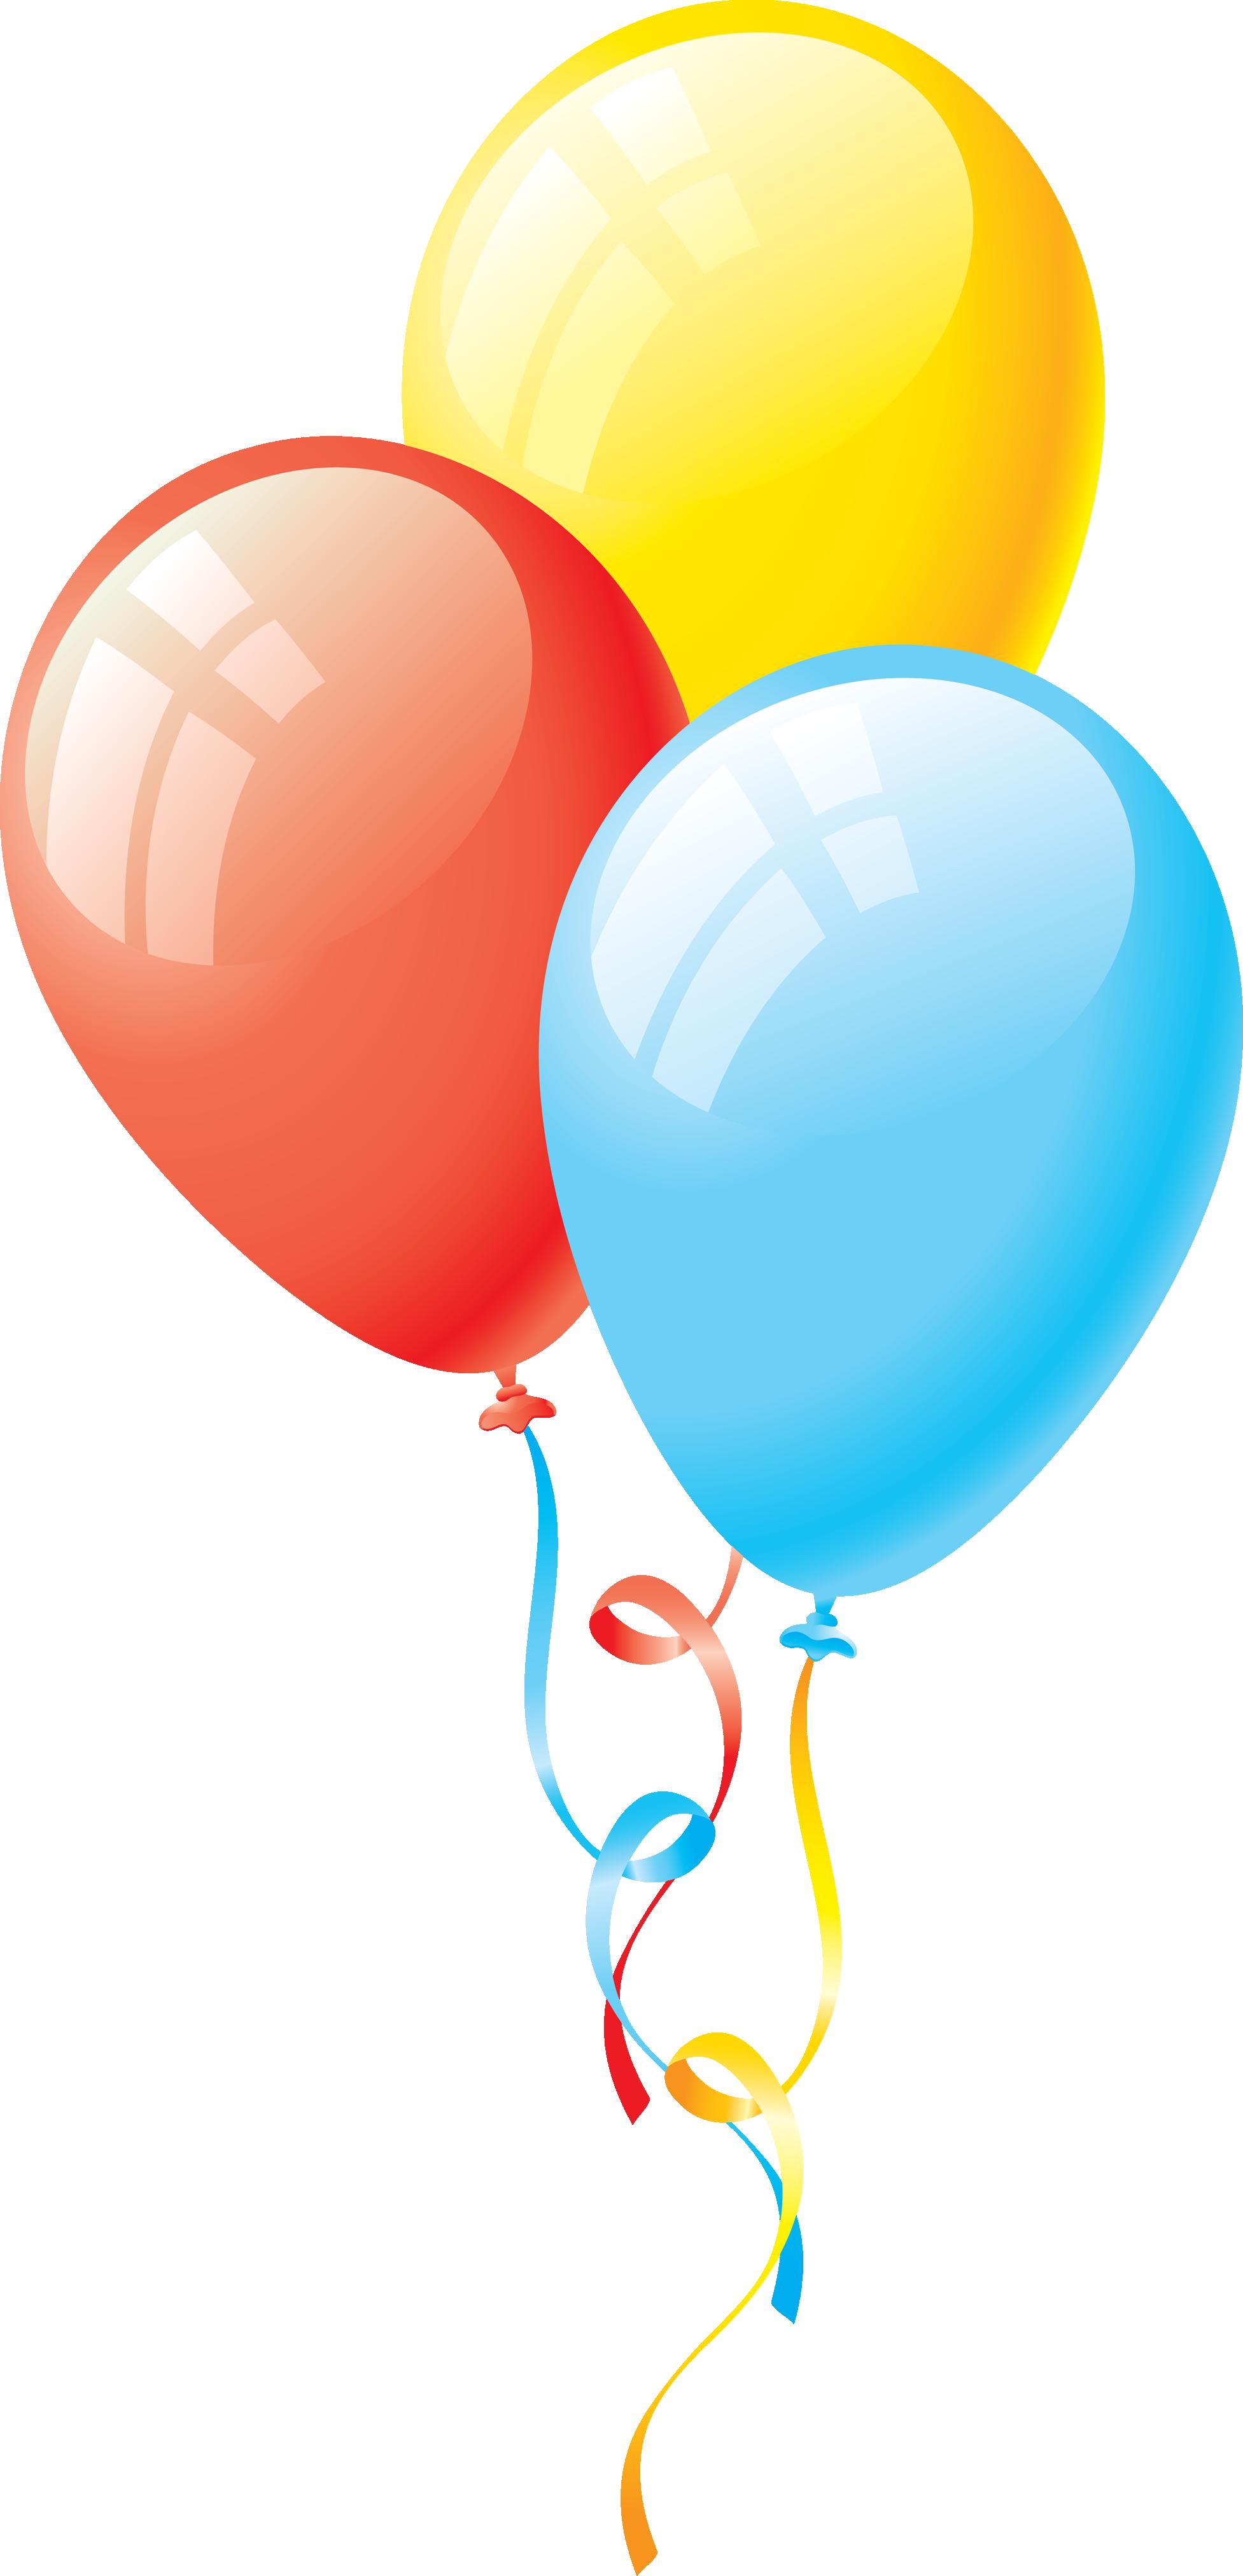 Balloons Png 5 PNG Image - Balloon HD PNG